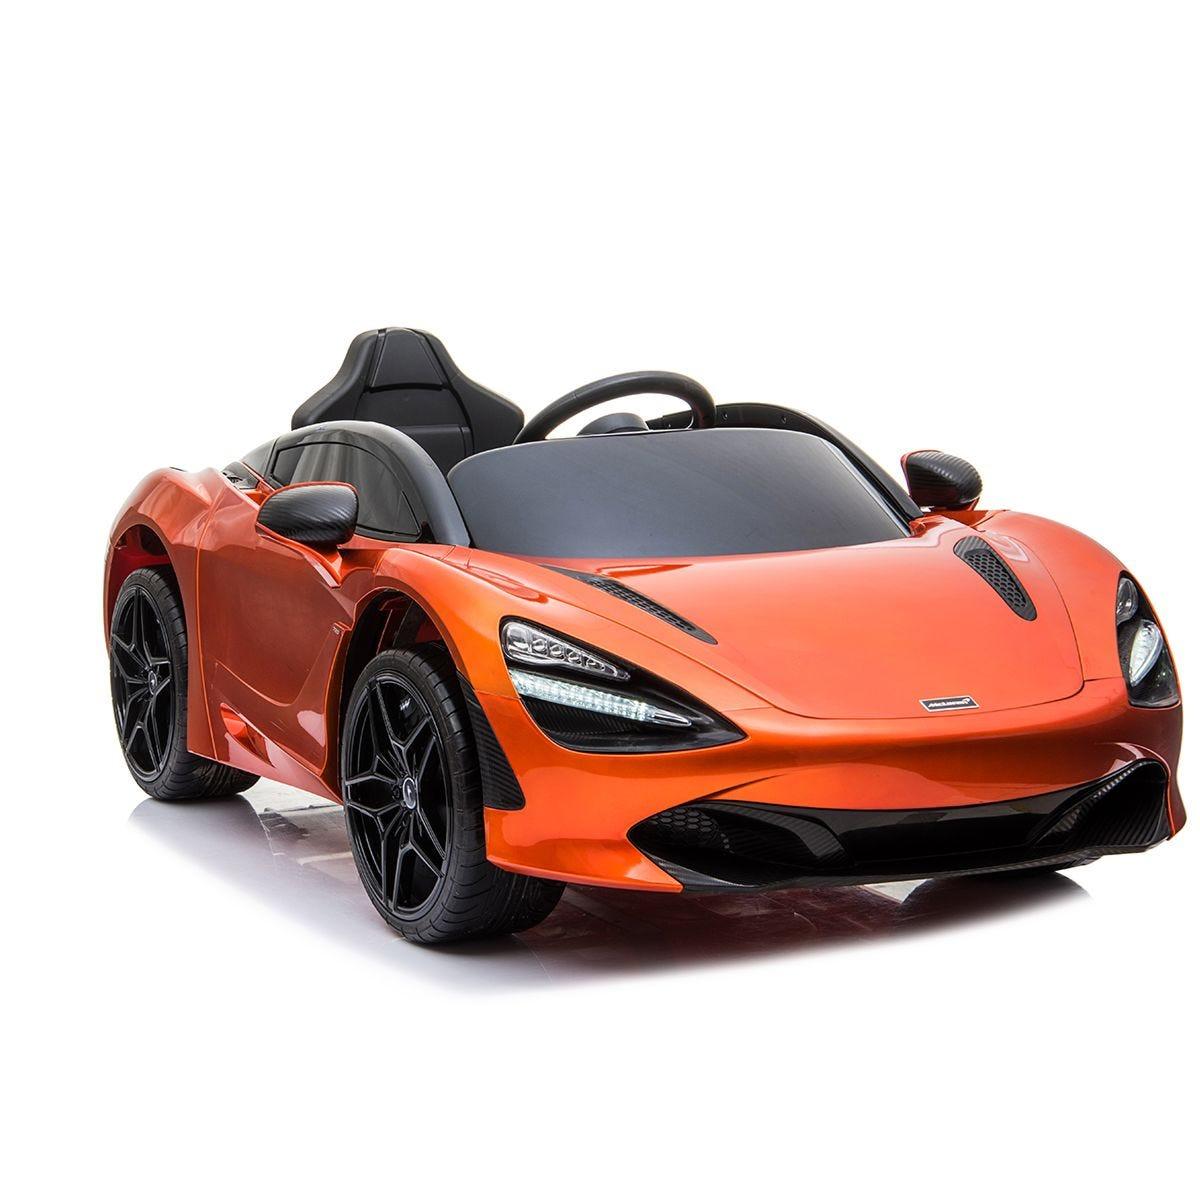 Ricco McLaren 720S Licensed Electric Ride on Toy Car - Orange